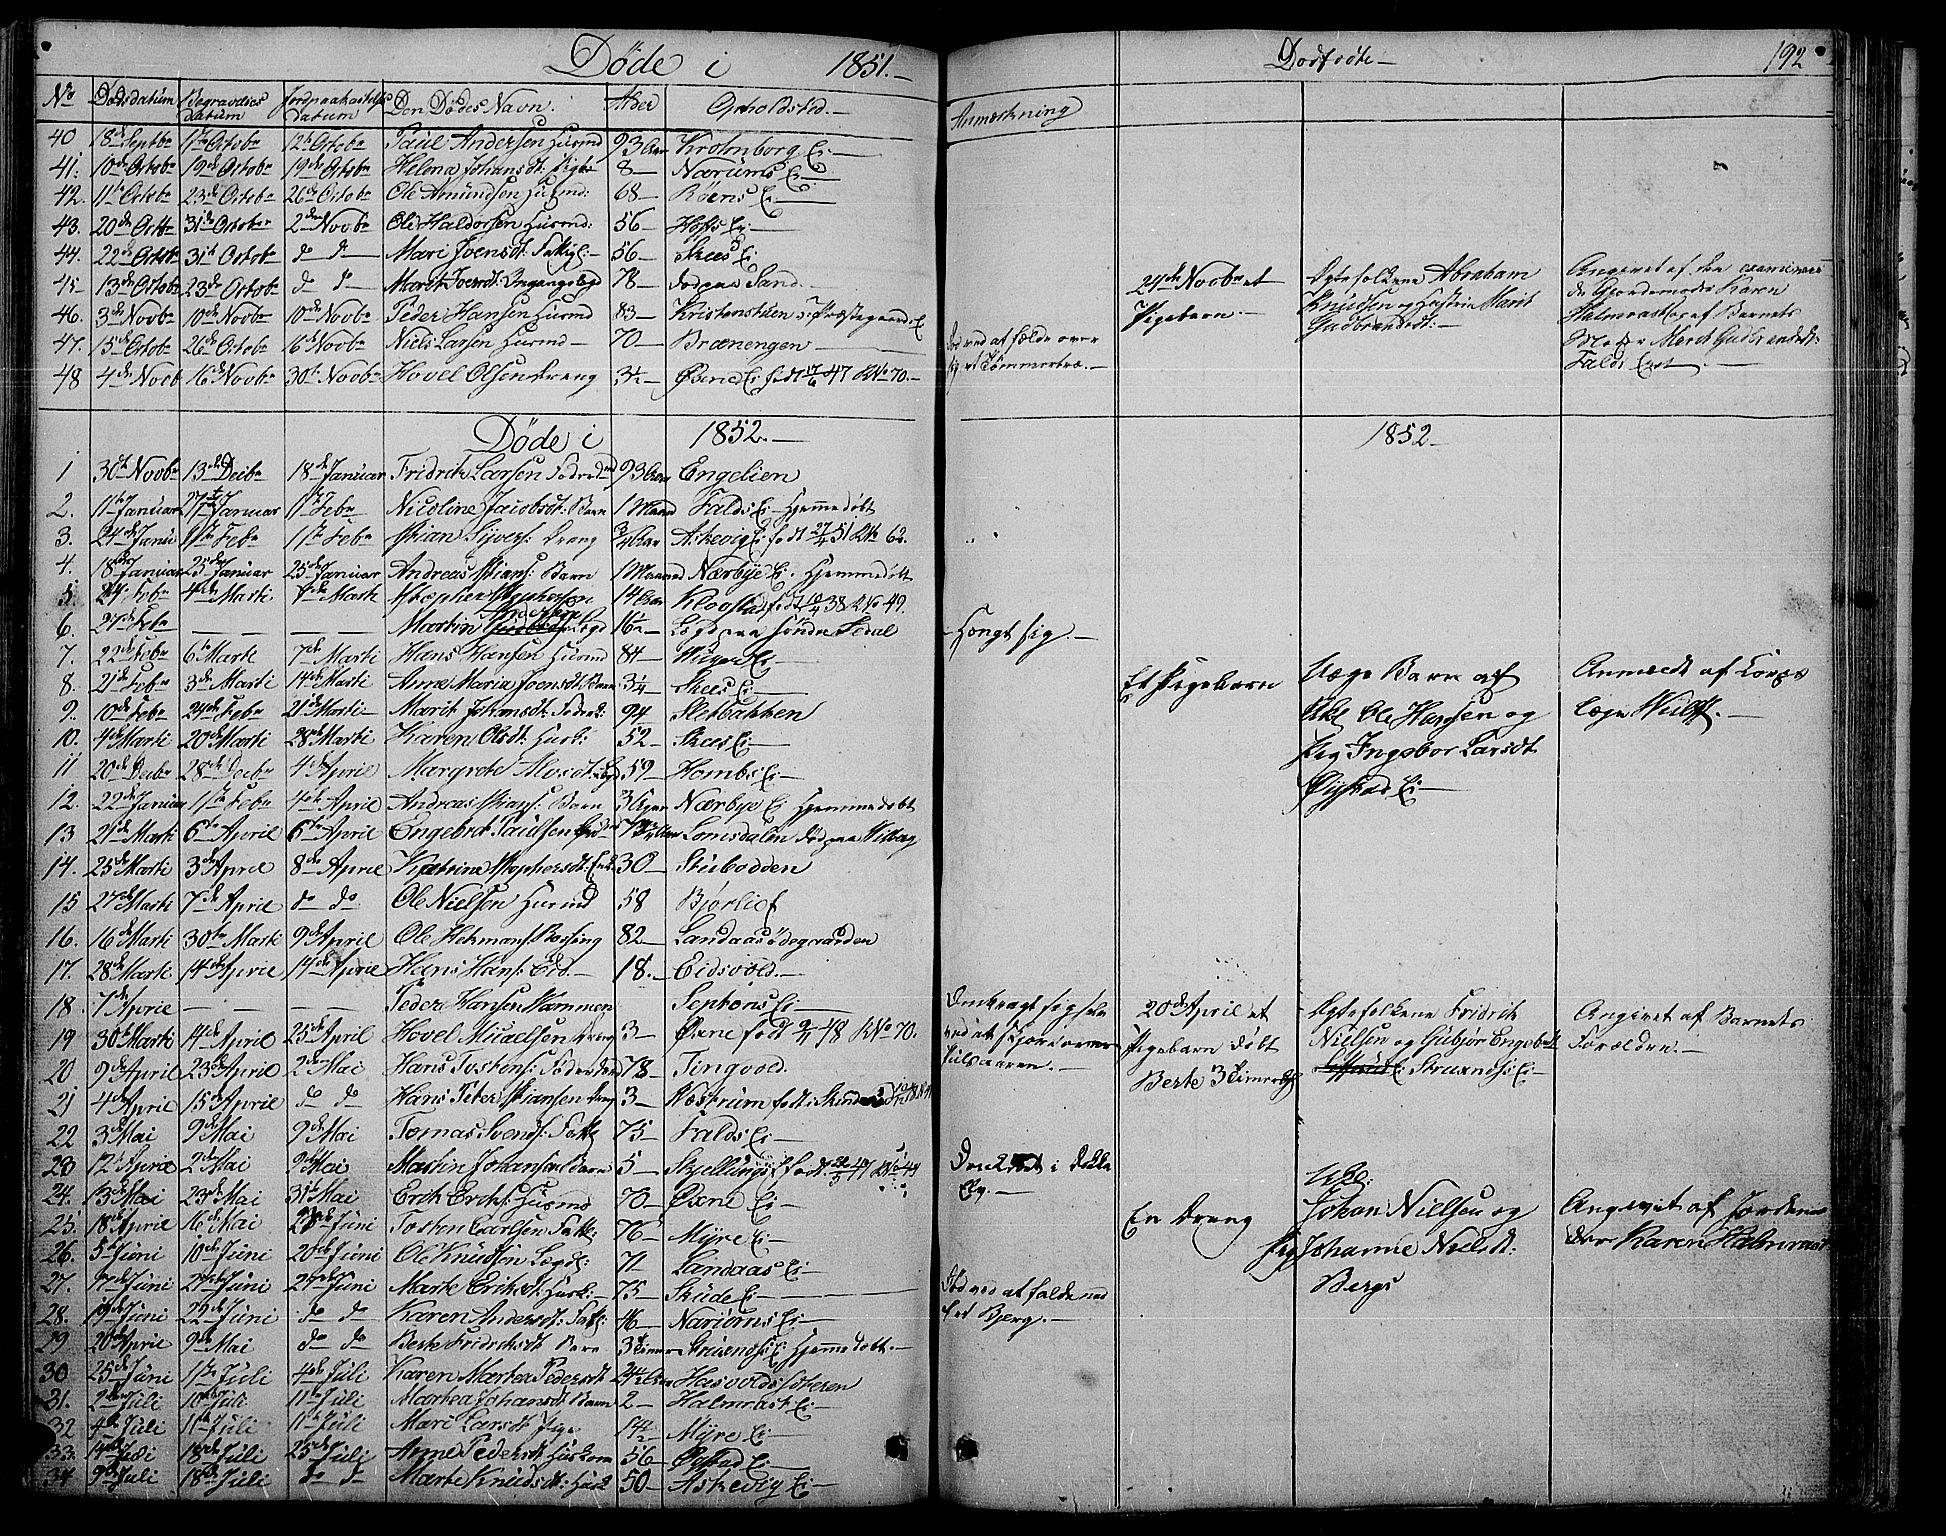 SAH, Søndre Land prestekontor, L/L0001: Klokkerbok nr. 1, 1849-1883, s. 192